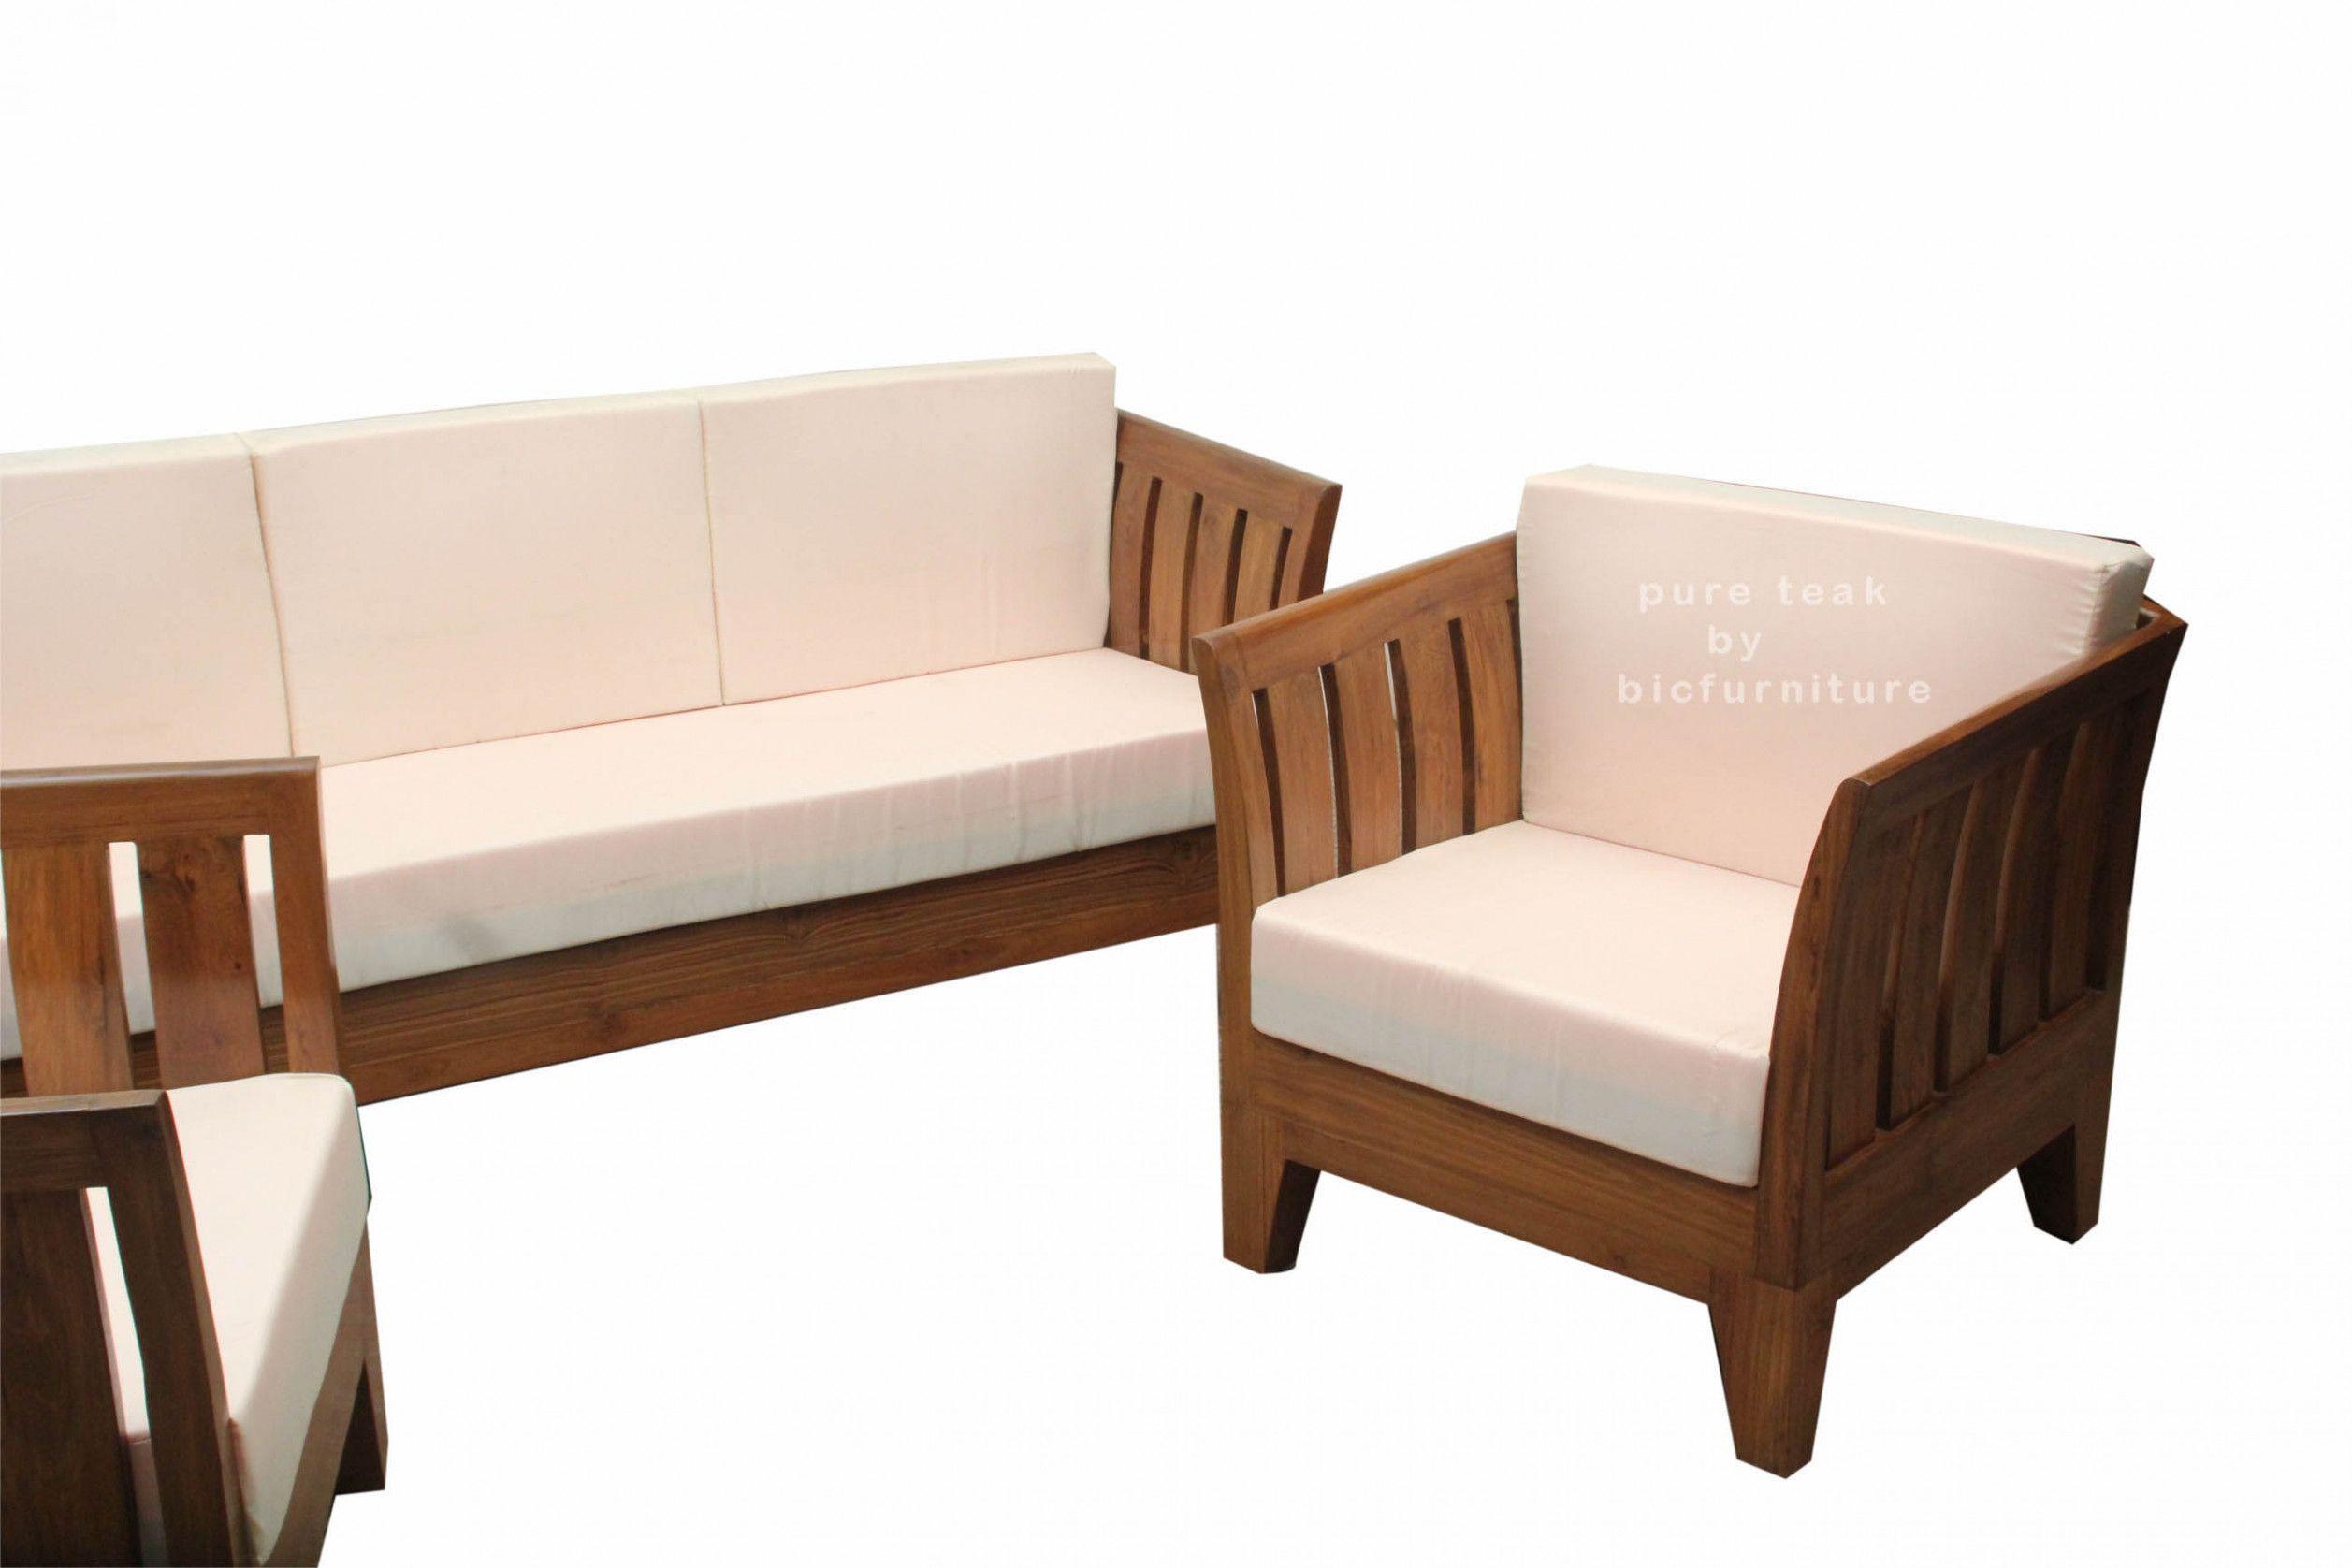 Teak Wood Sofa Set Ws 10 Design Of Teak Wood Sofa Set